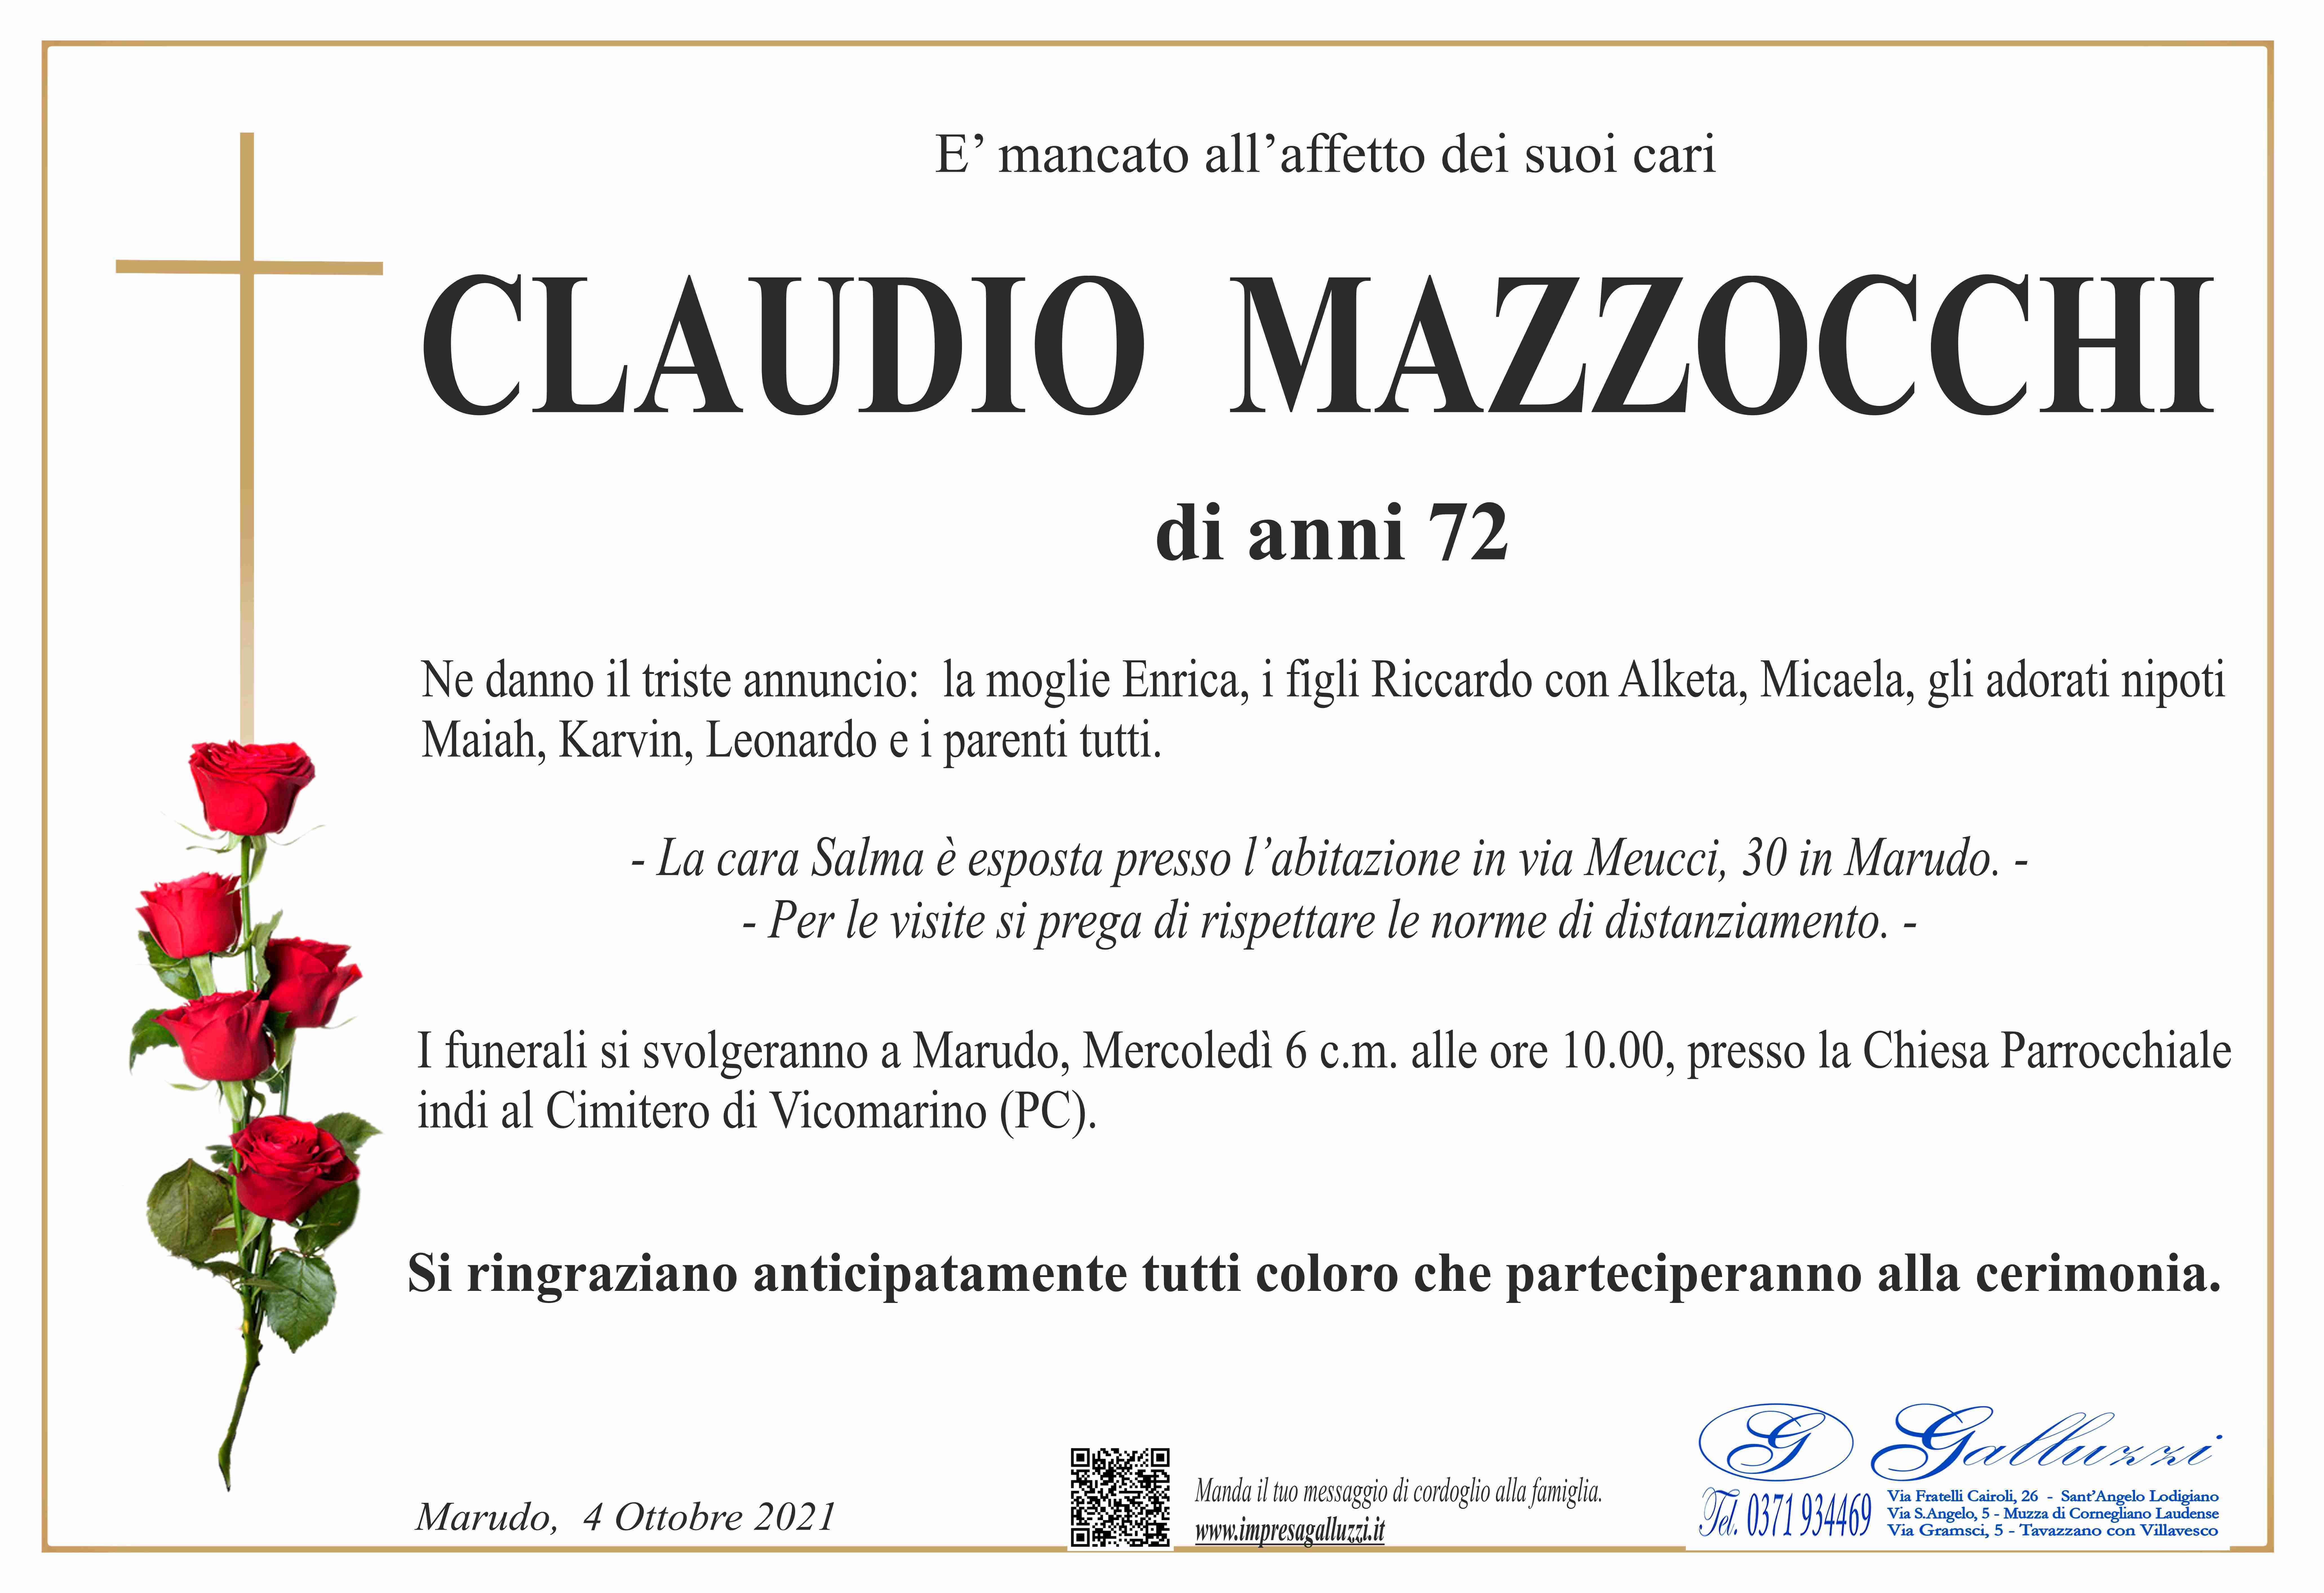 Claudio Mazzocchi